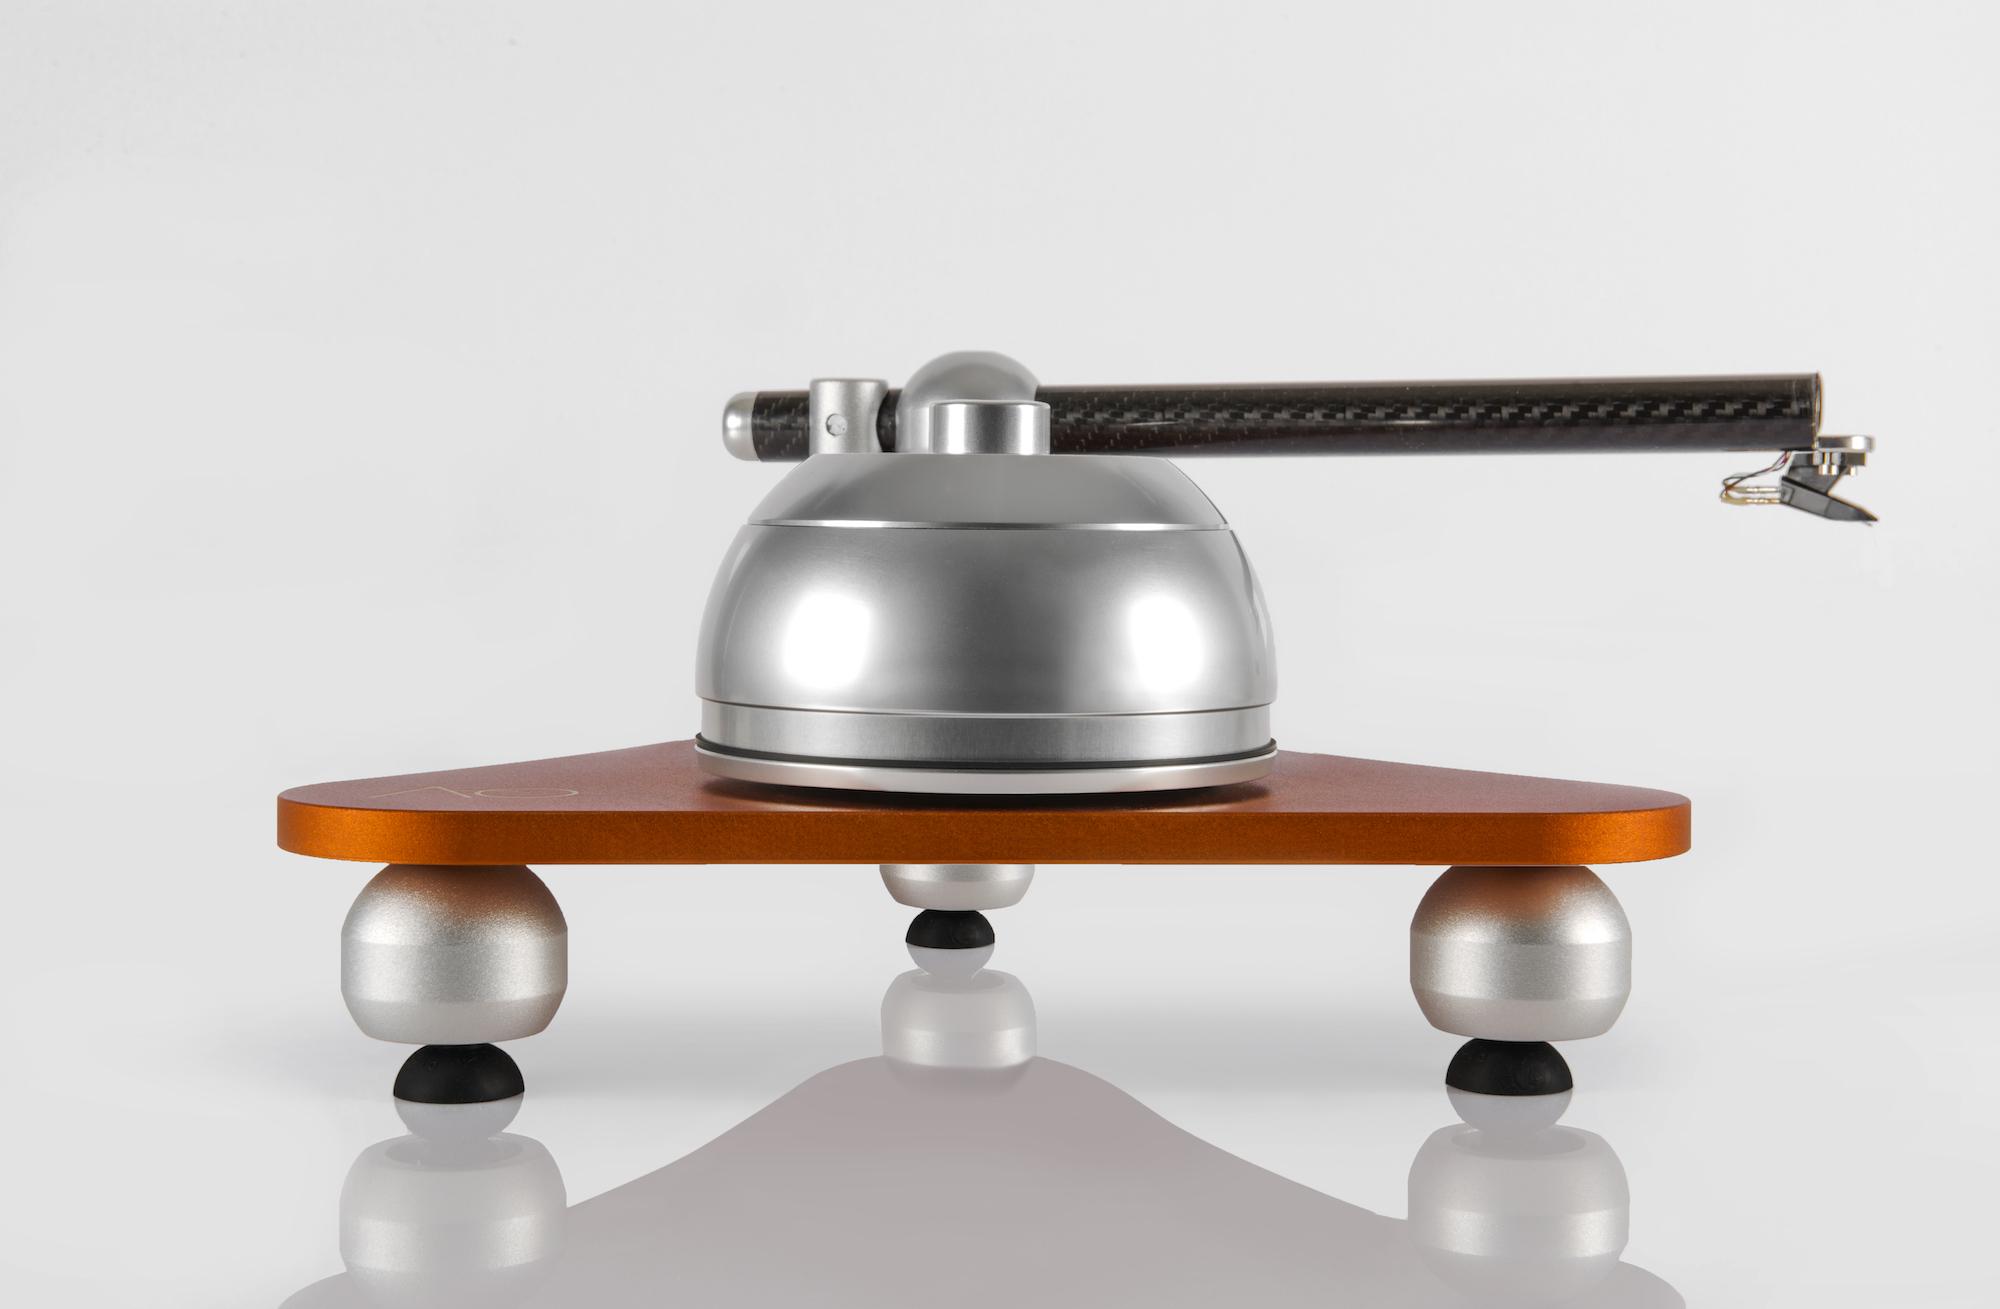 Atmo Sfera Platterless Turntable looks a bit like a drone